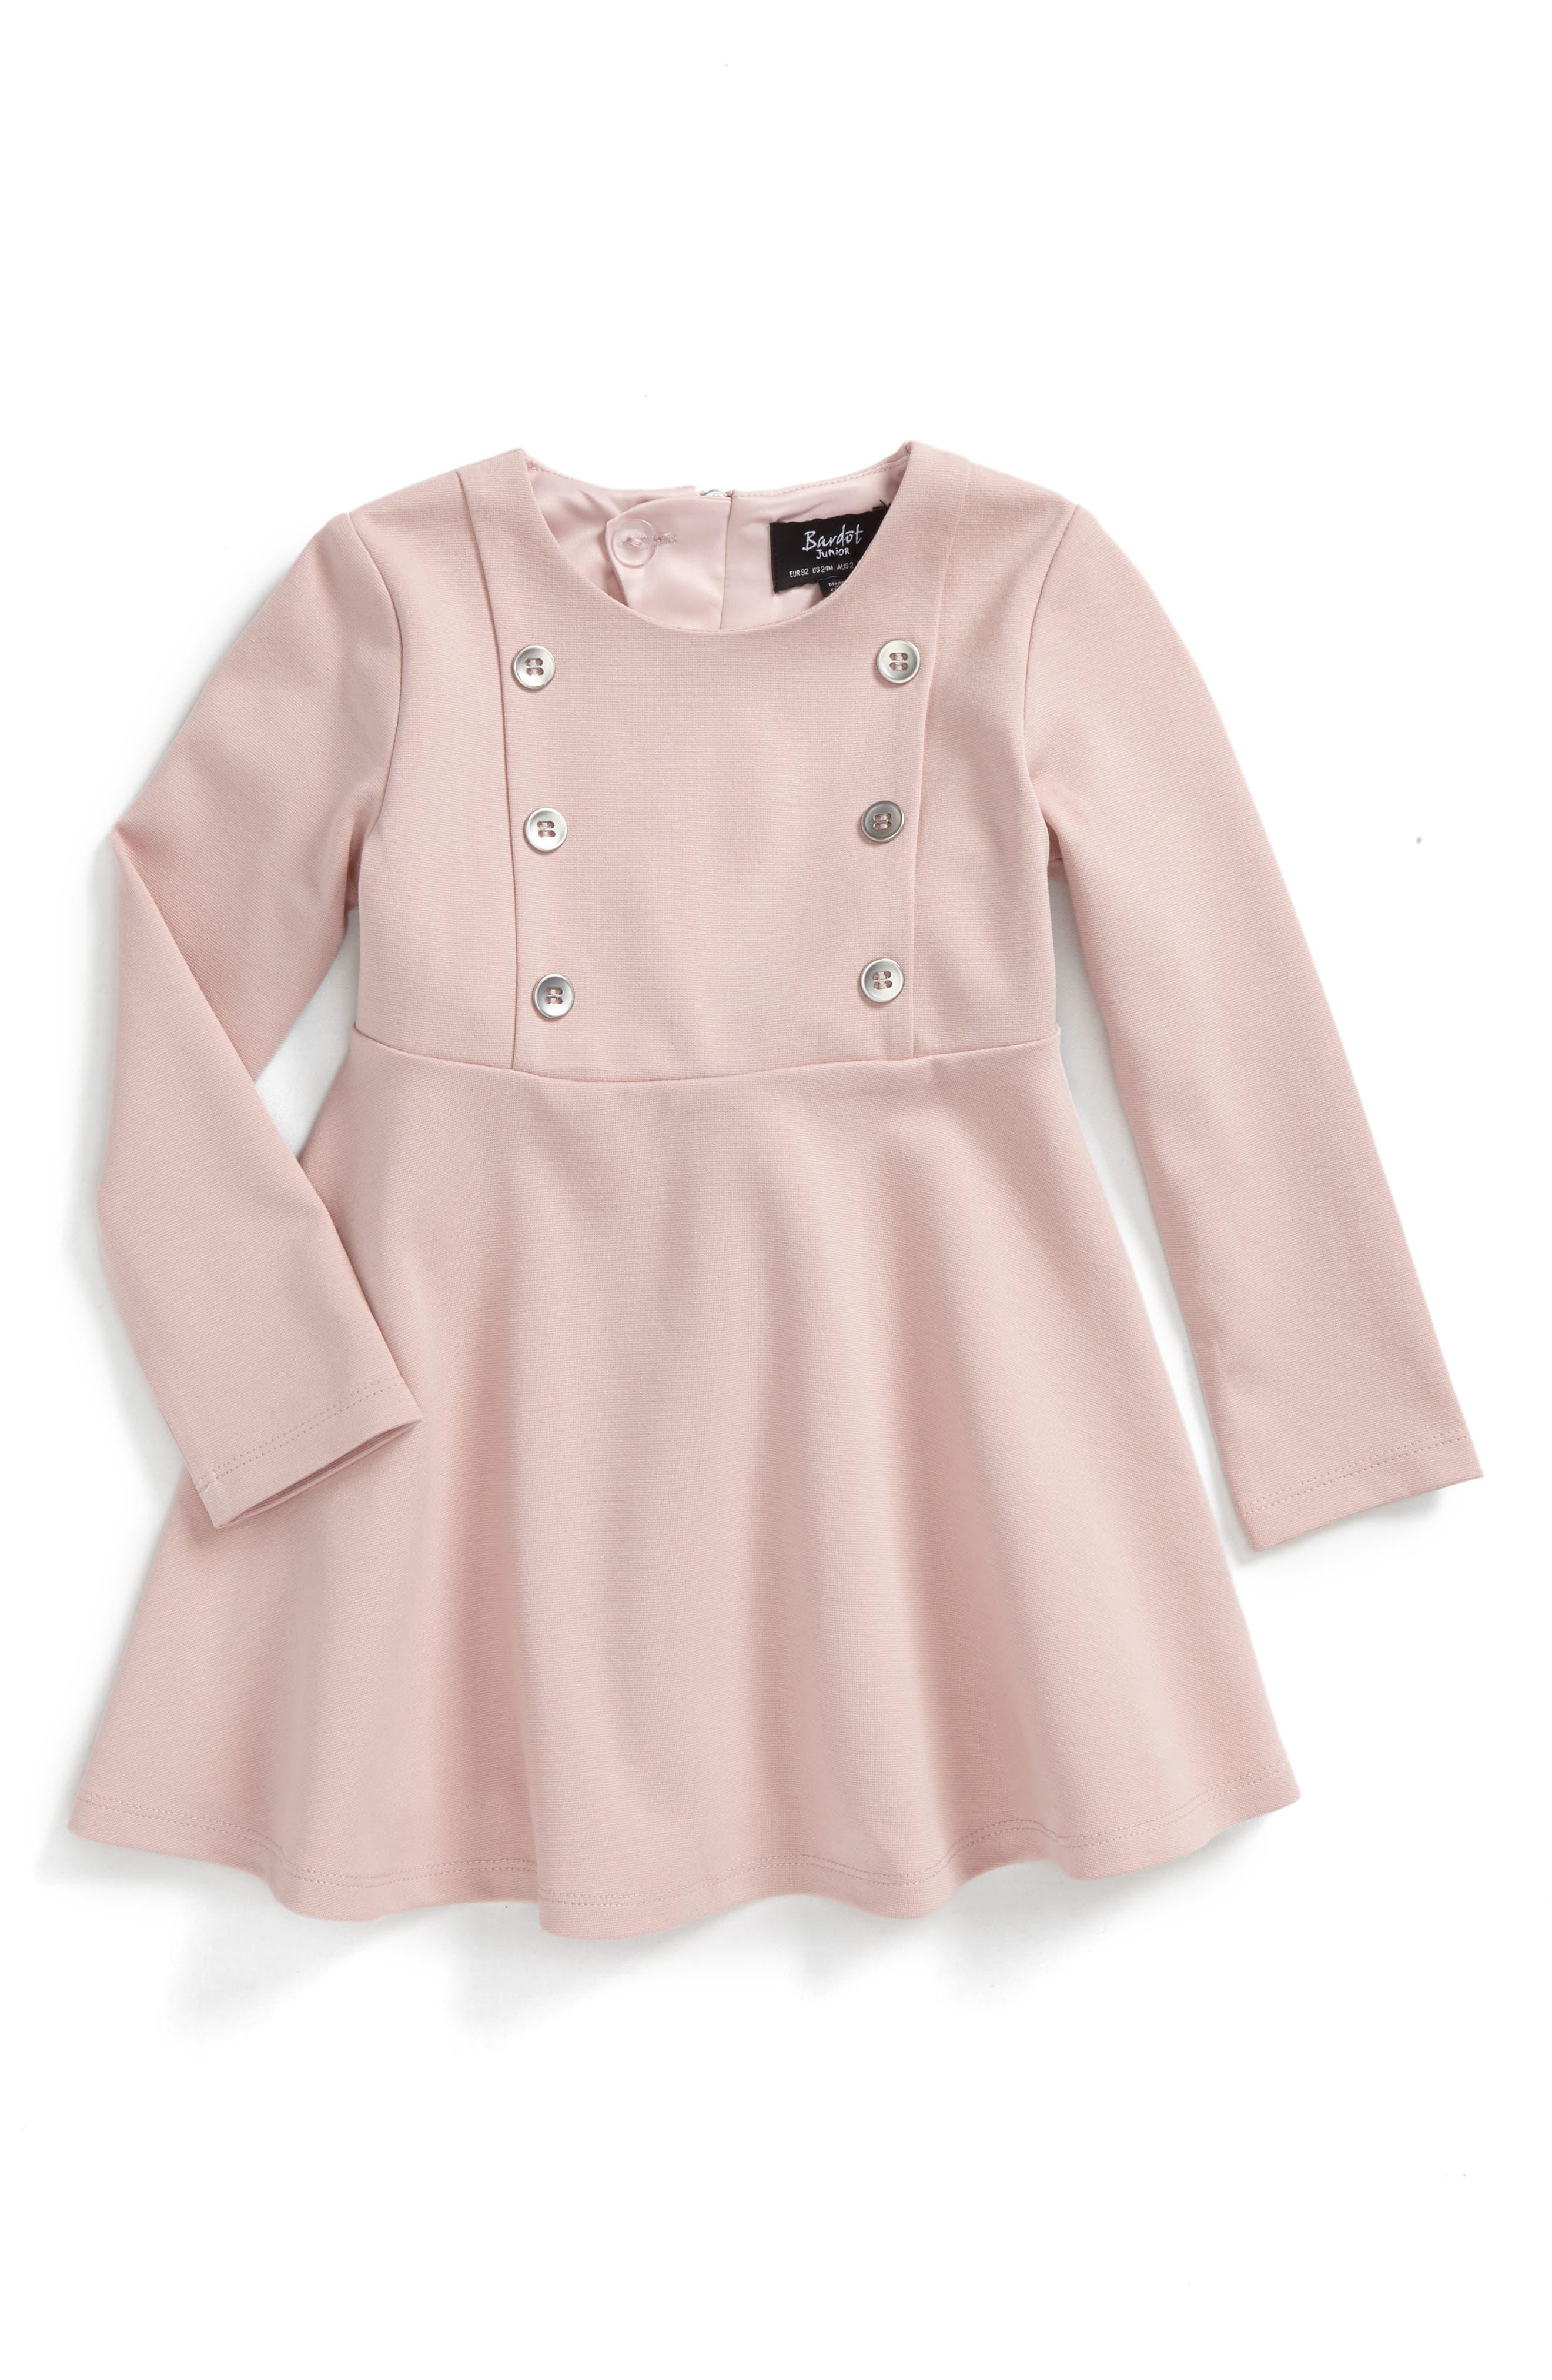 Main Image - Bardot Junior Button Front Dress (Baby Girls & Toddler Girls)